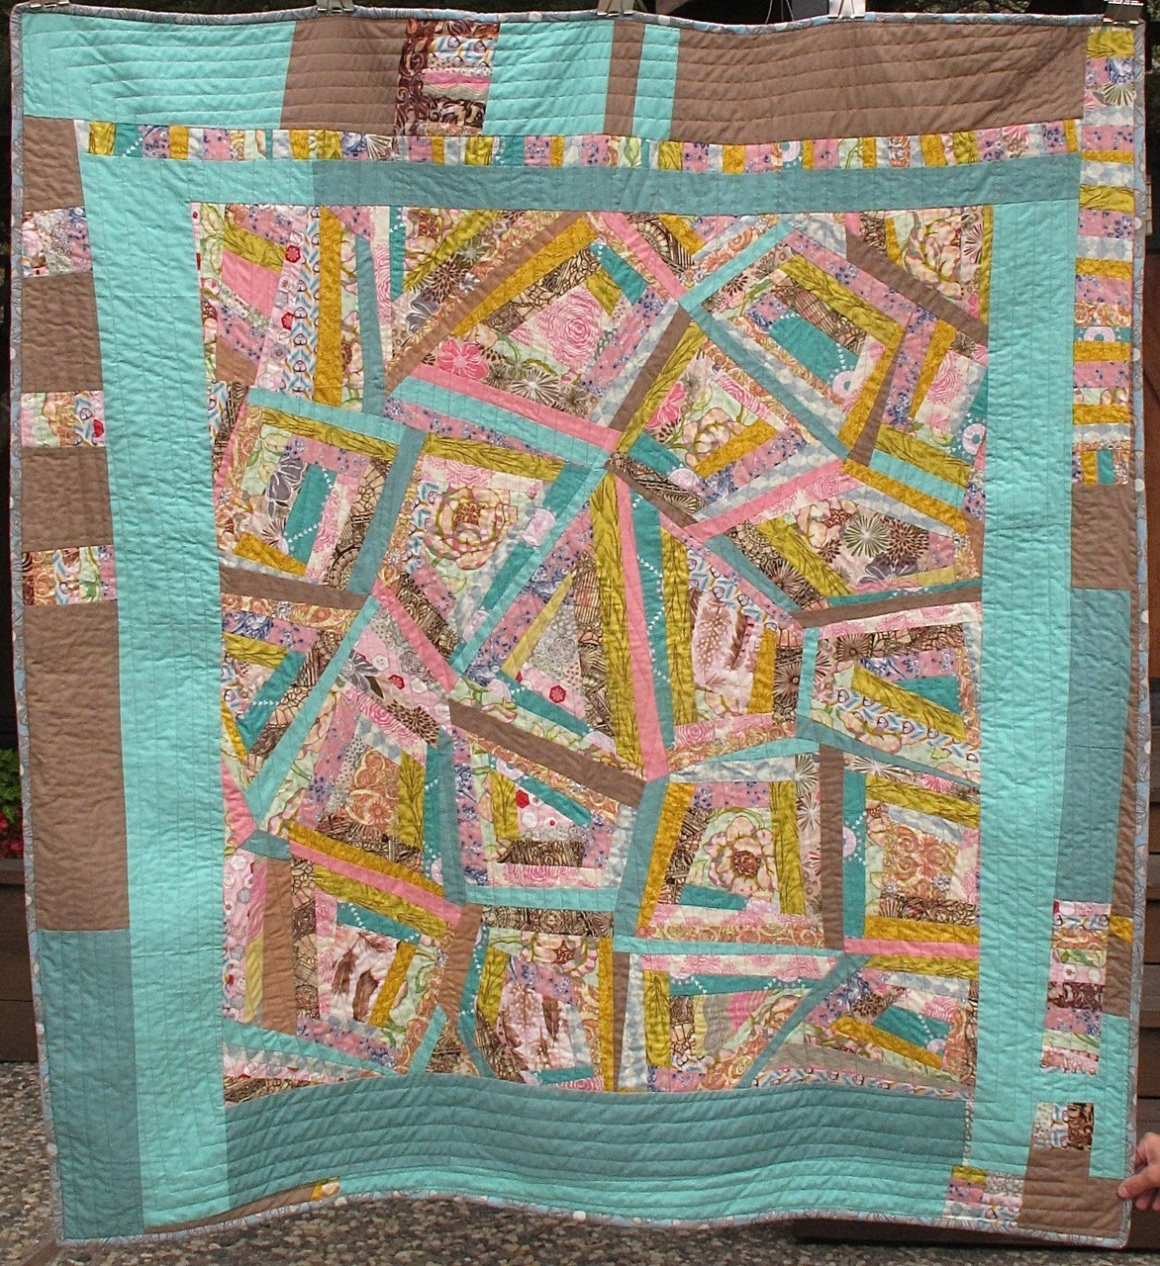 King Khalsa quilt by Carol Van Zandt